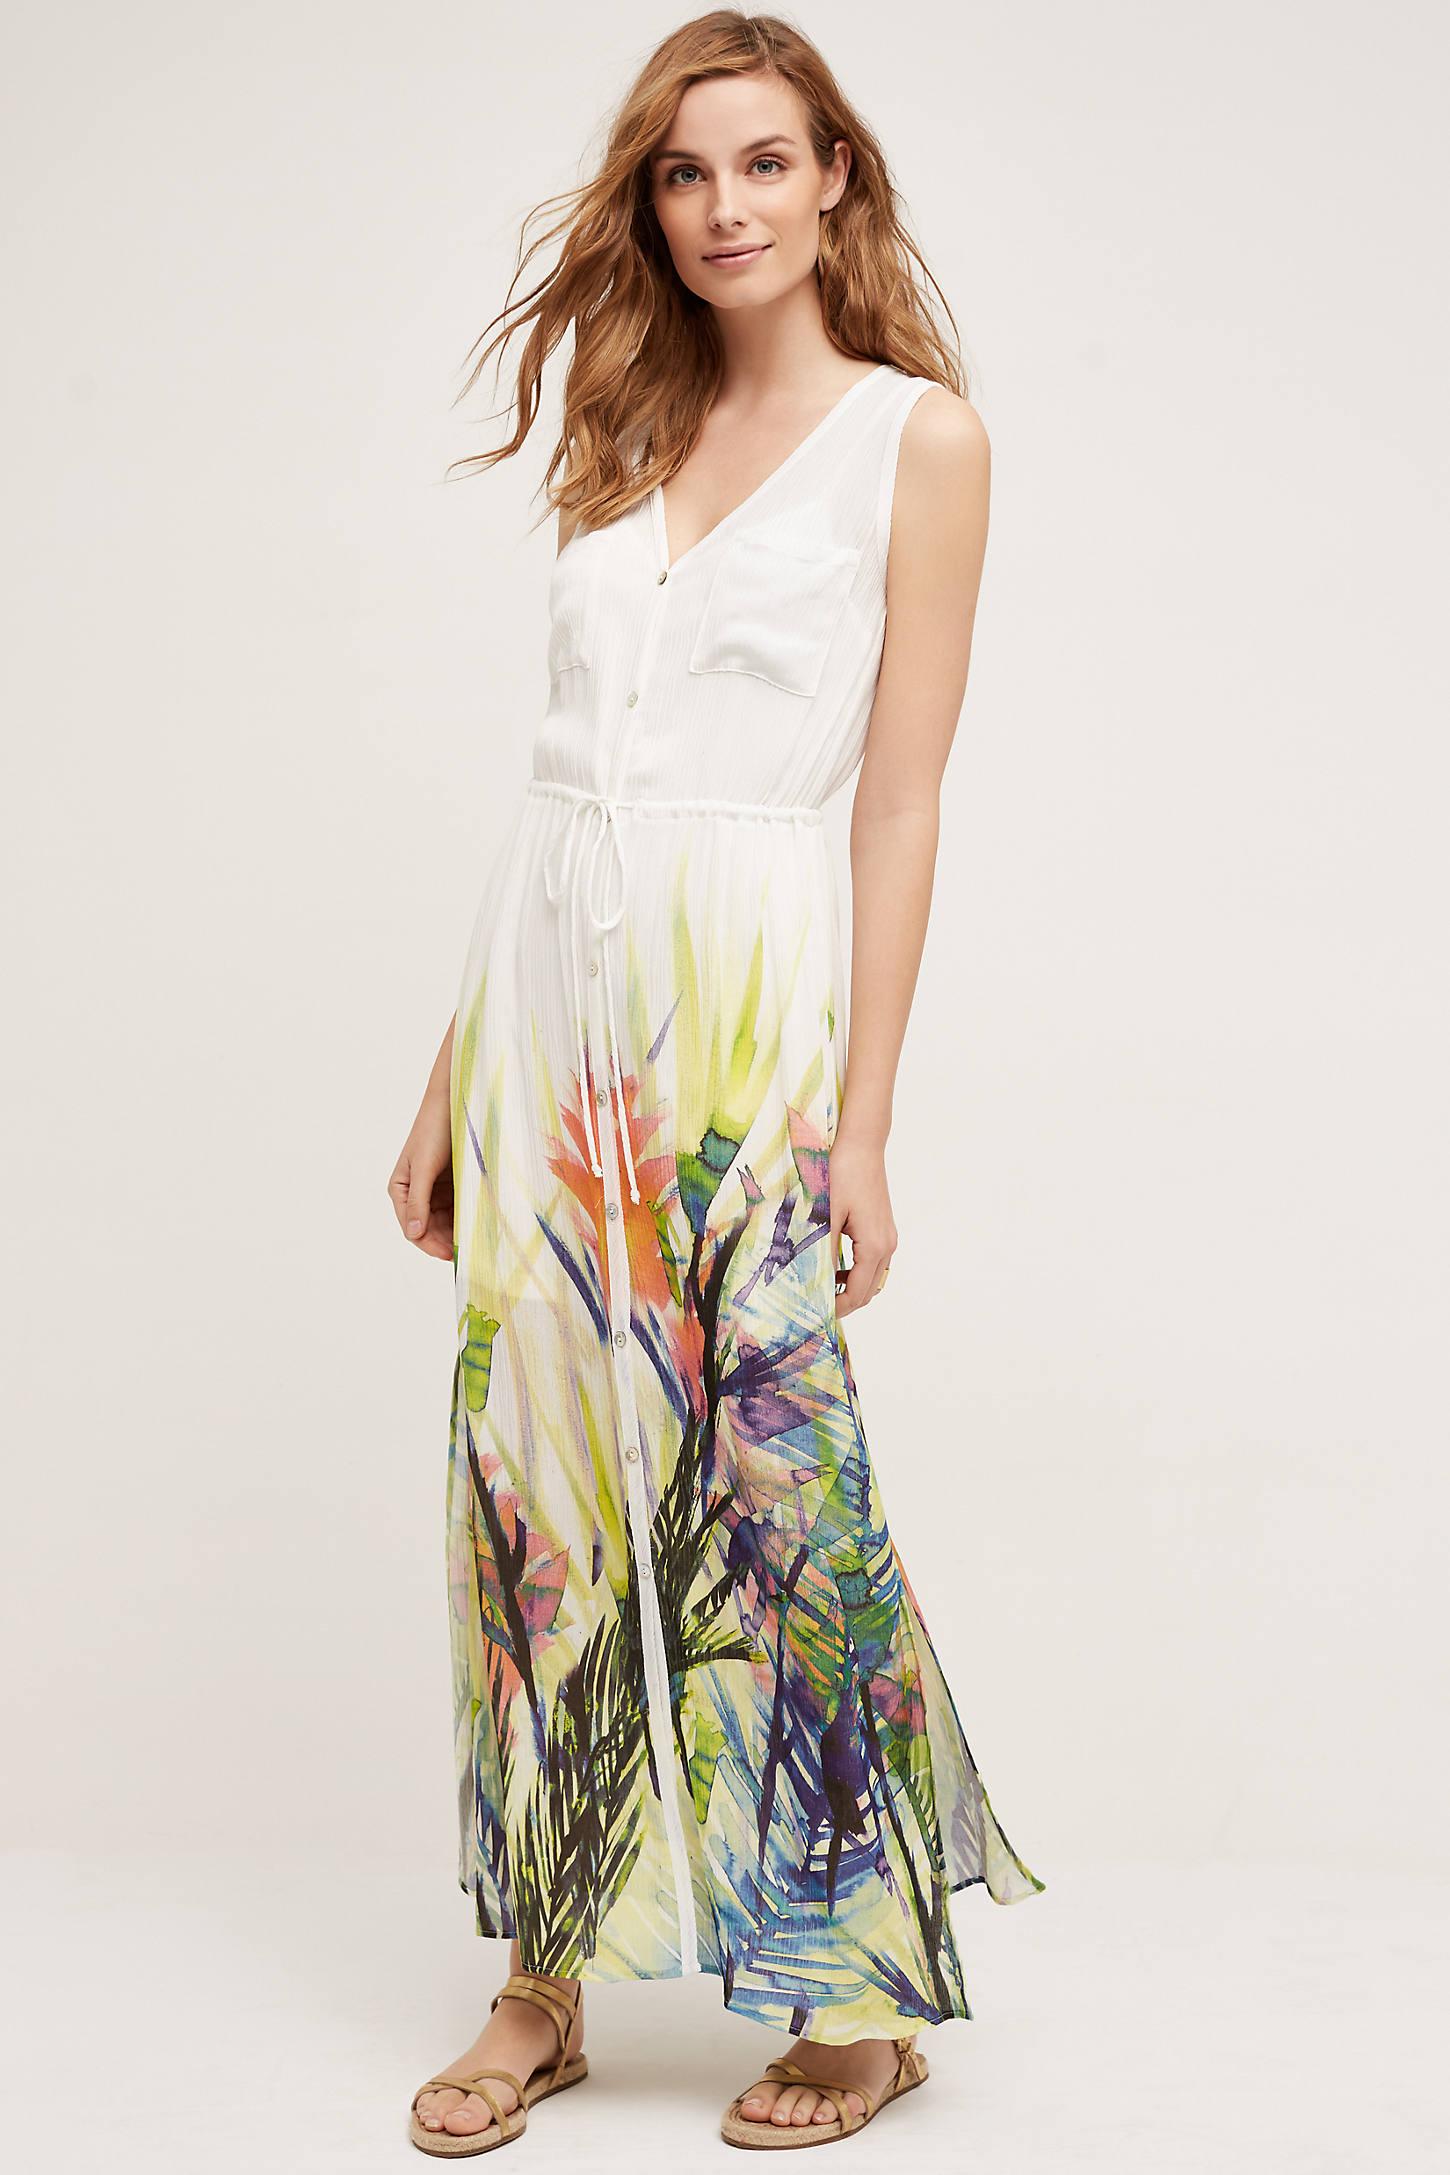 Watergarden Beach Dress